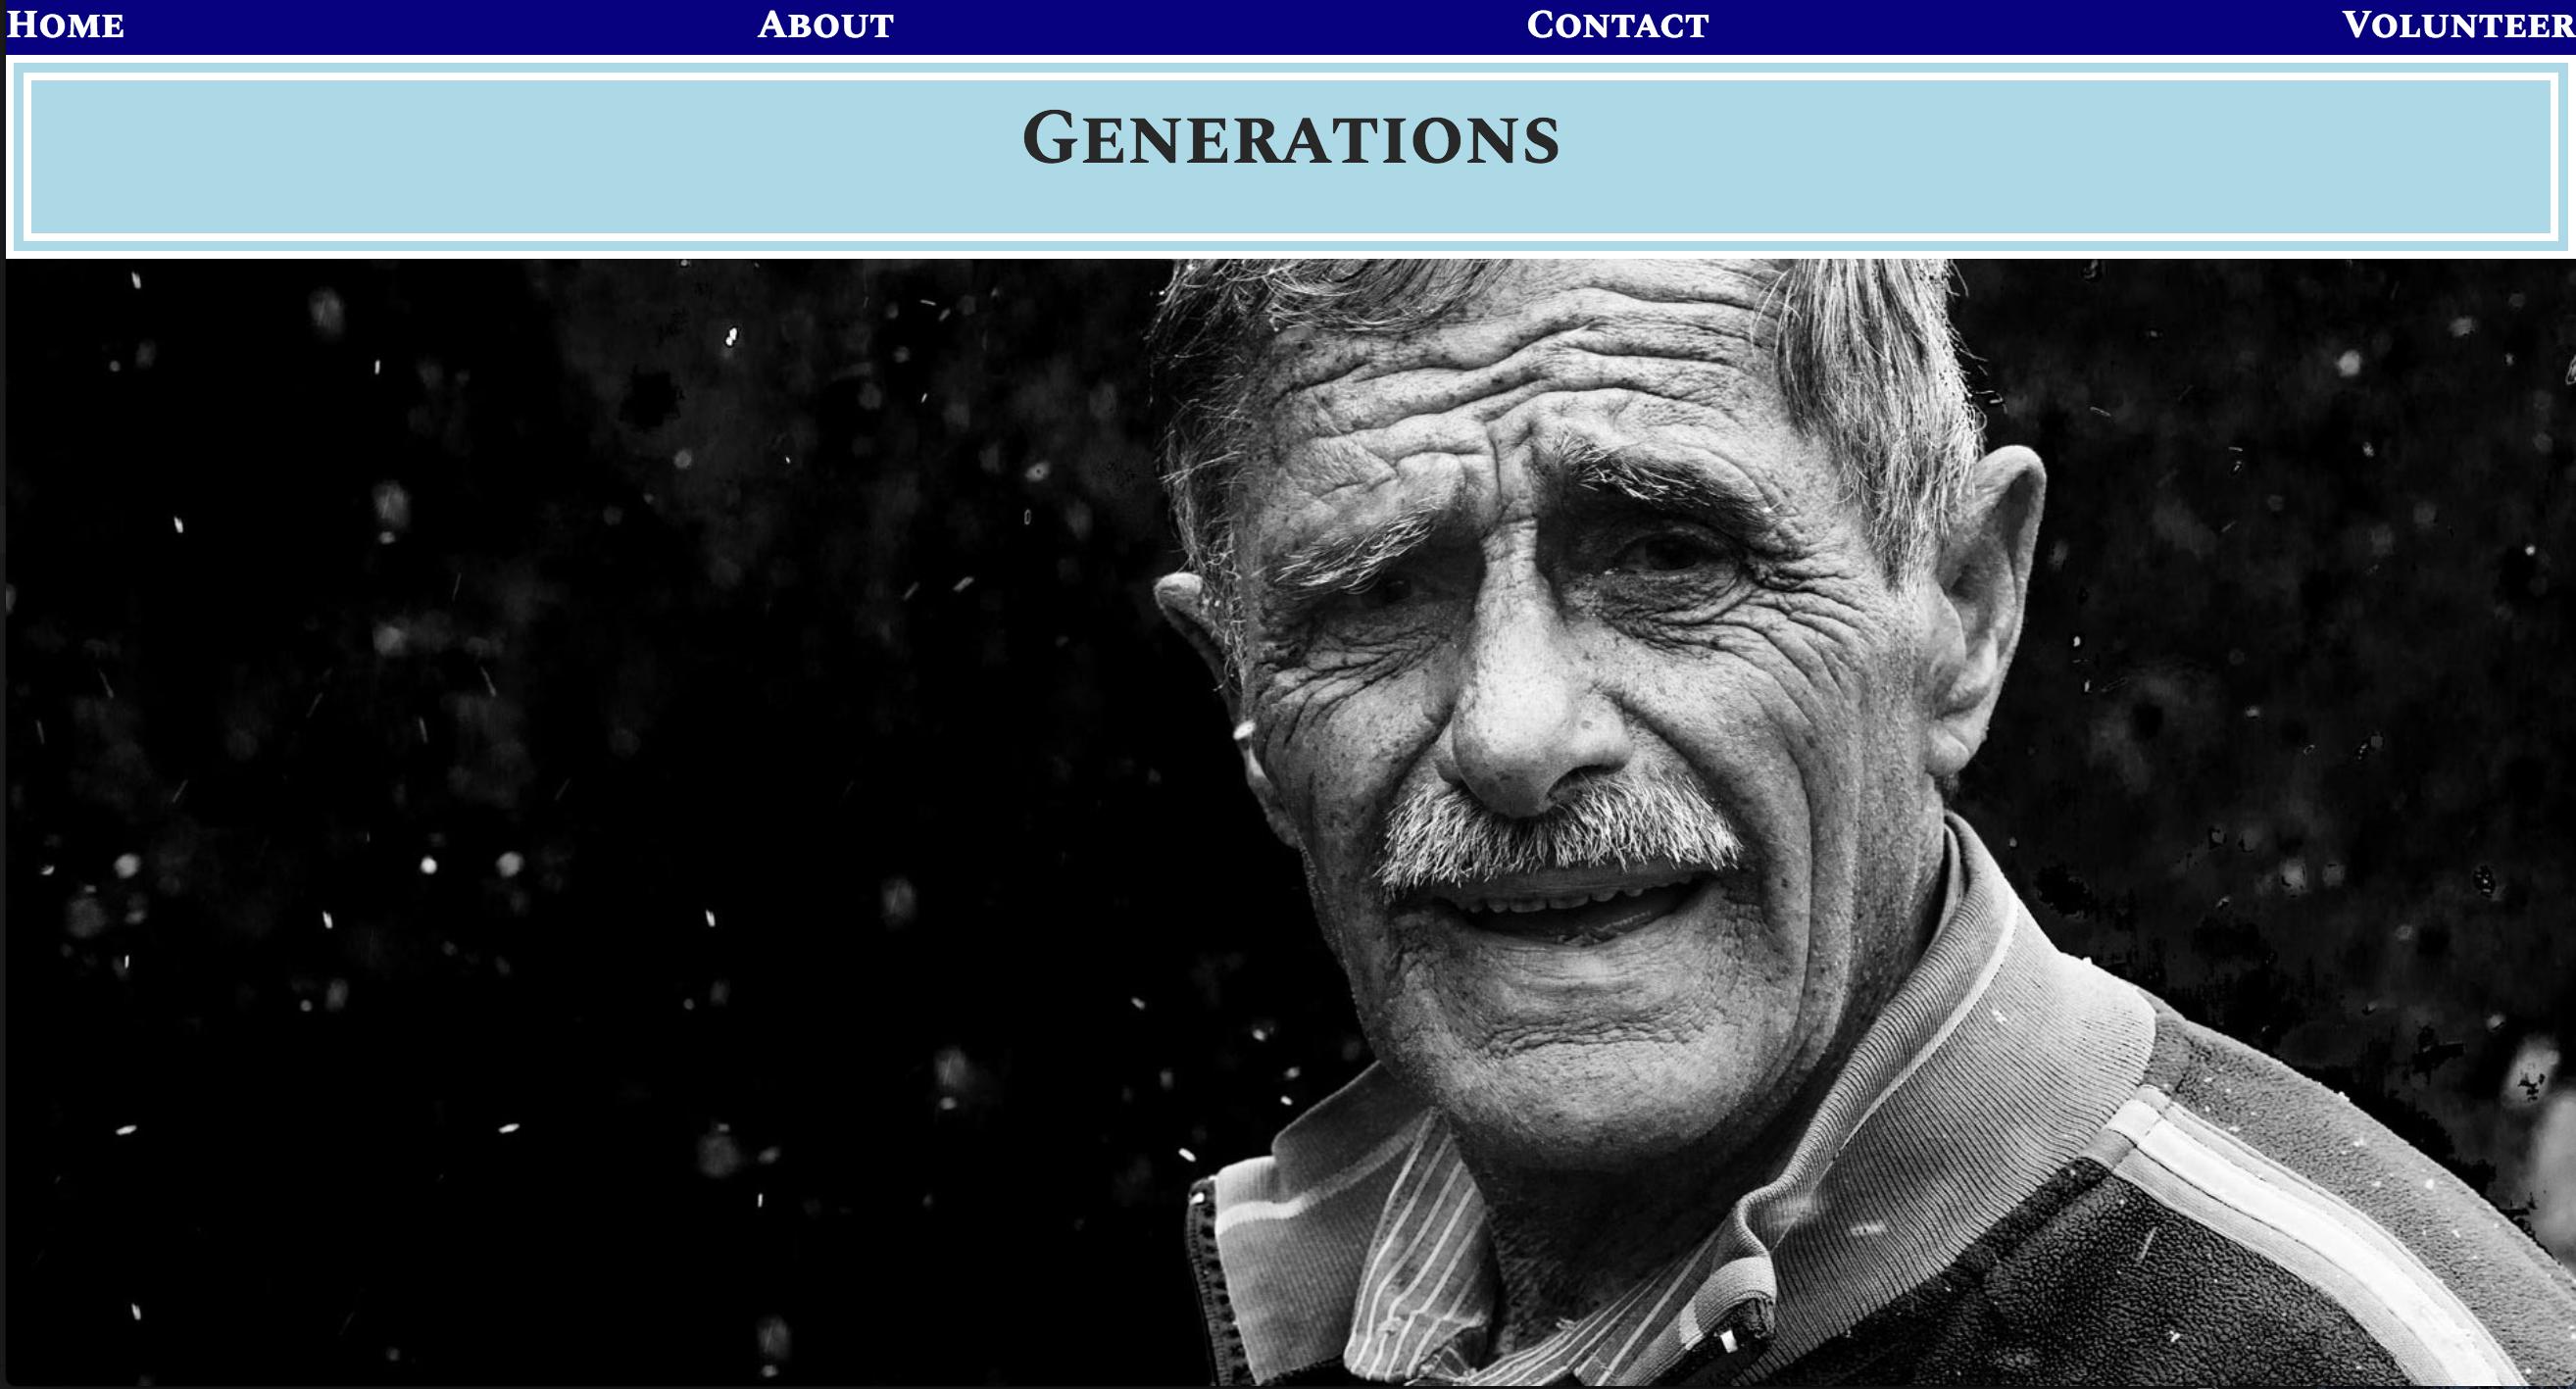 older-man-generations